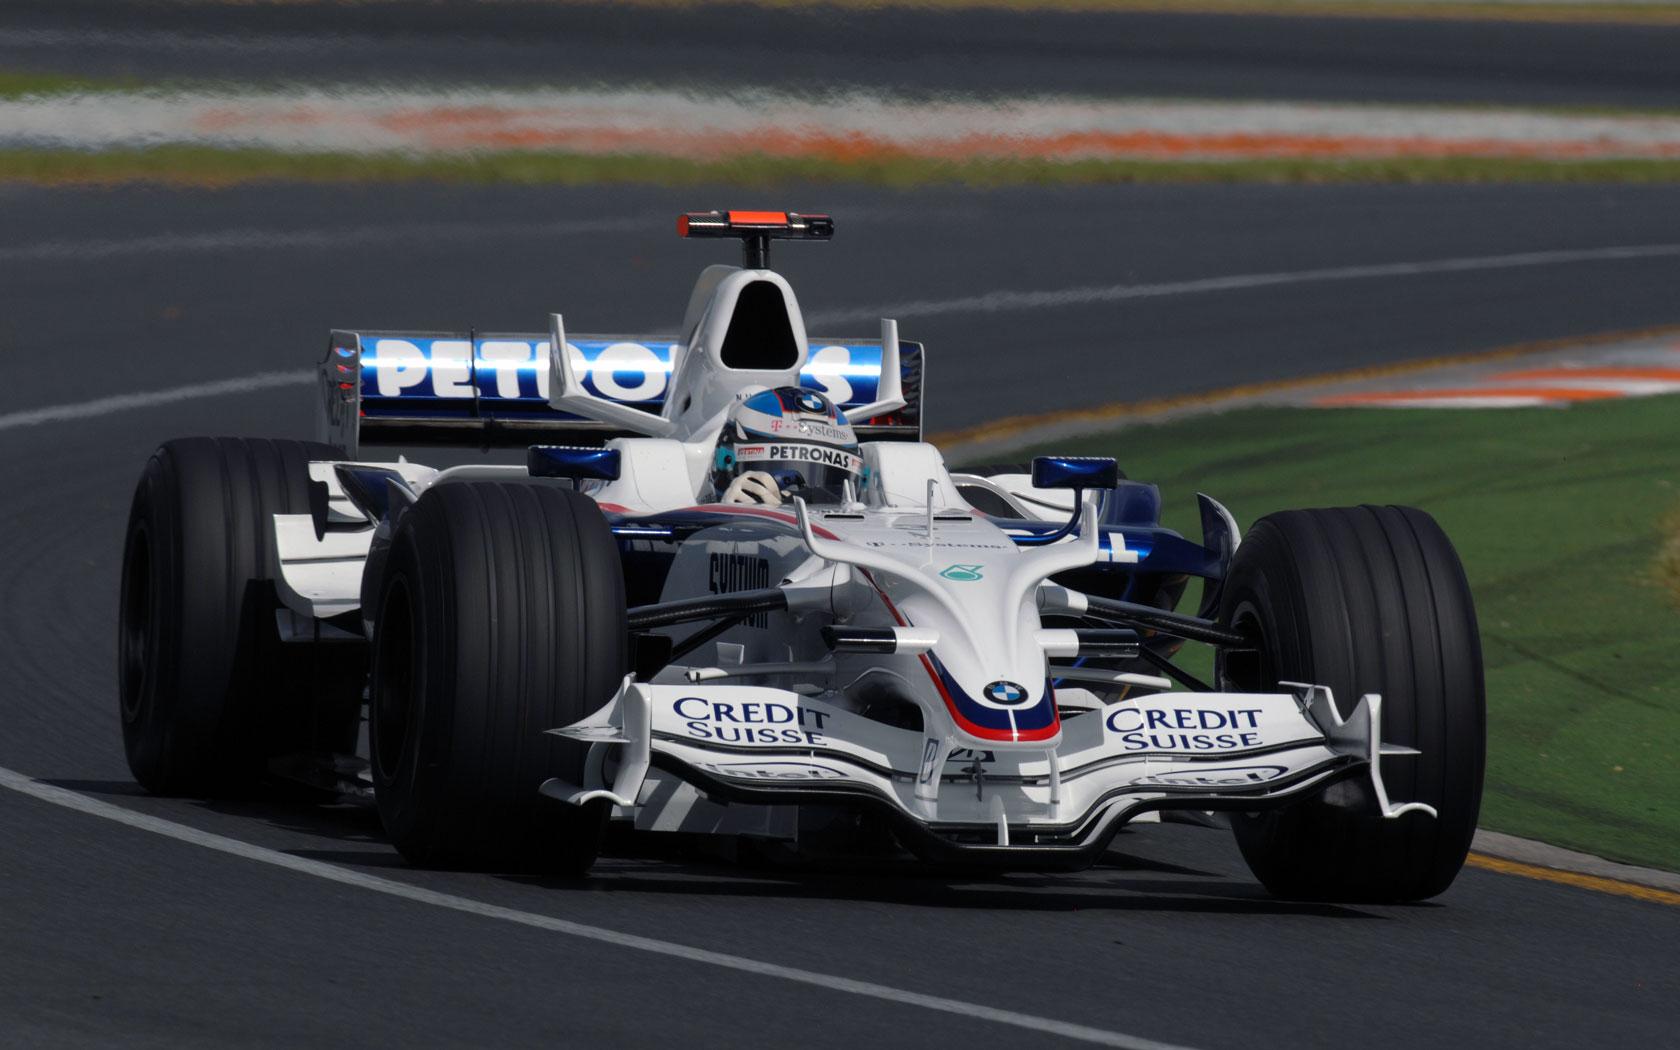 HD Wallpapers 2008 Formula 1 Grand Prix of Australia | F1 ...